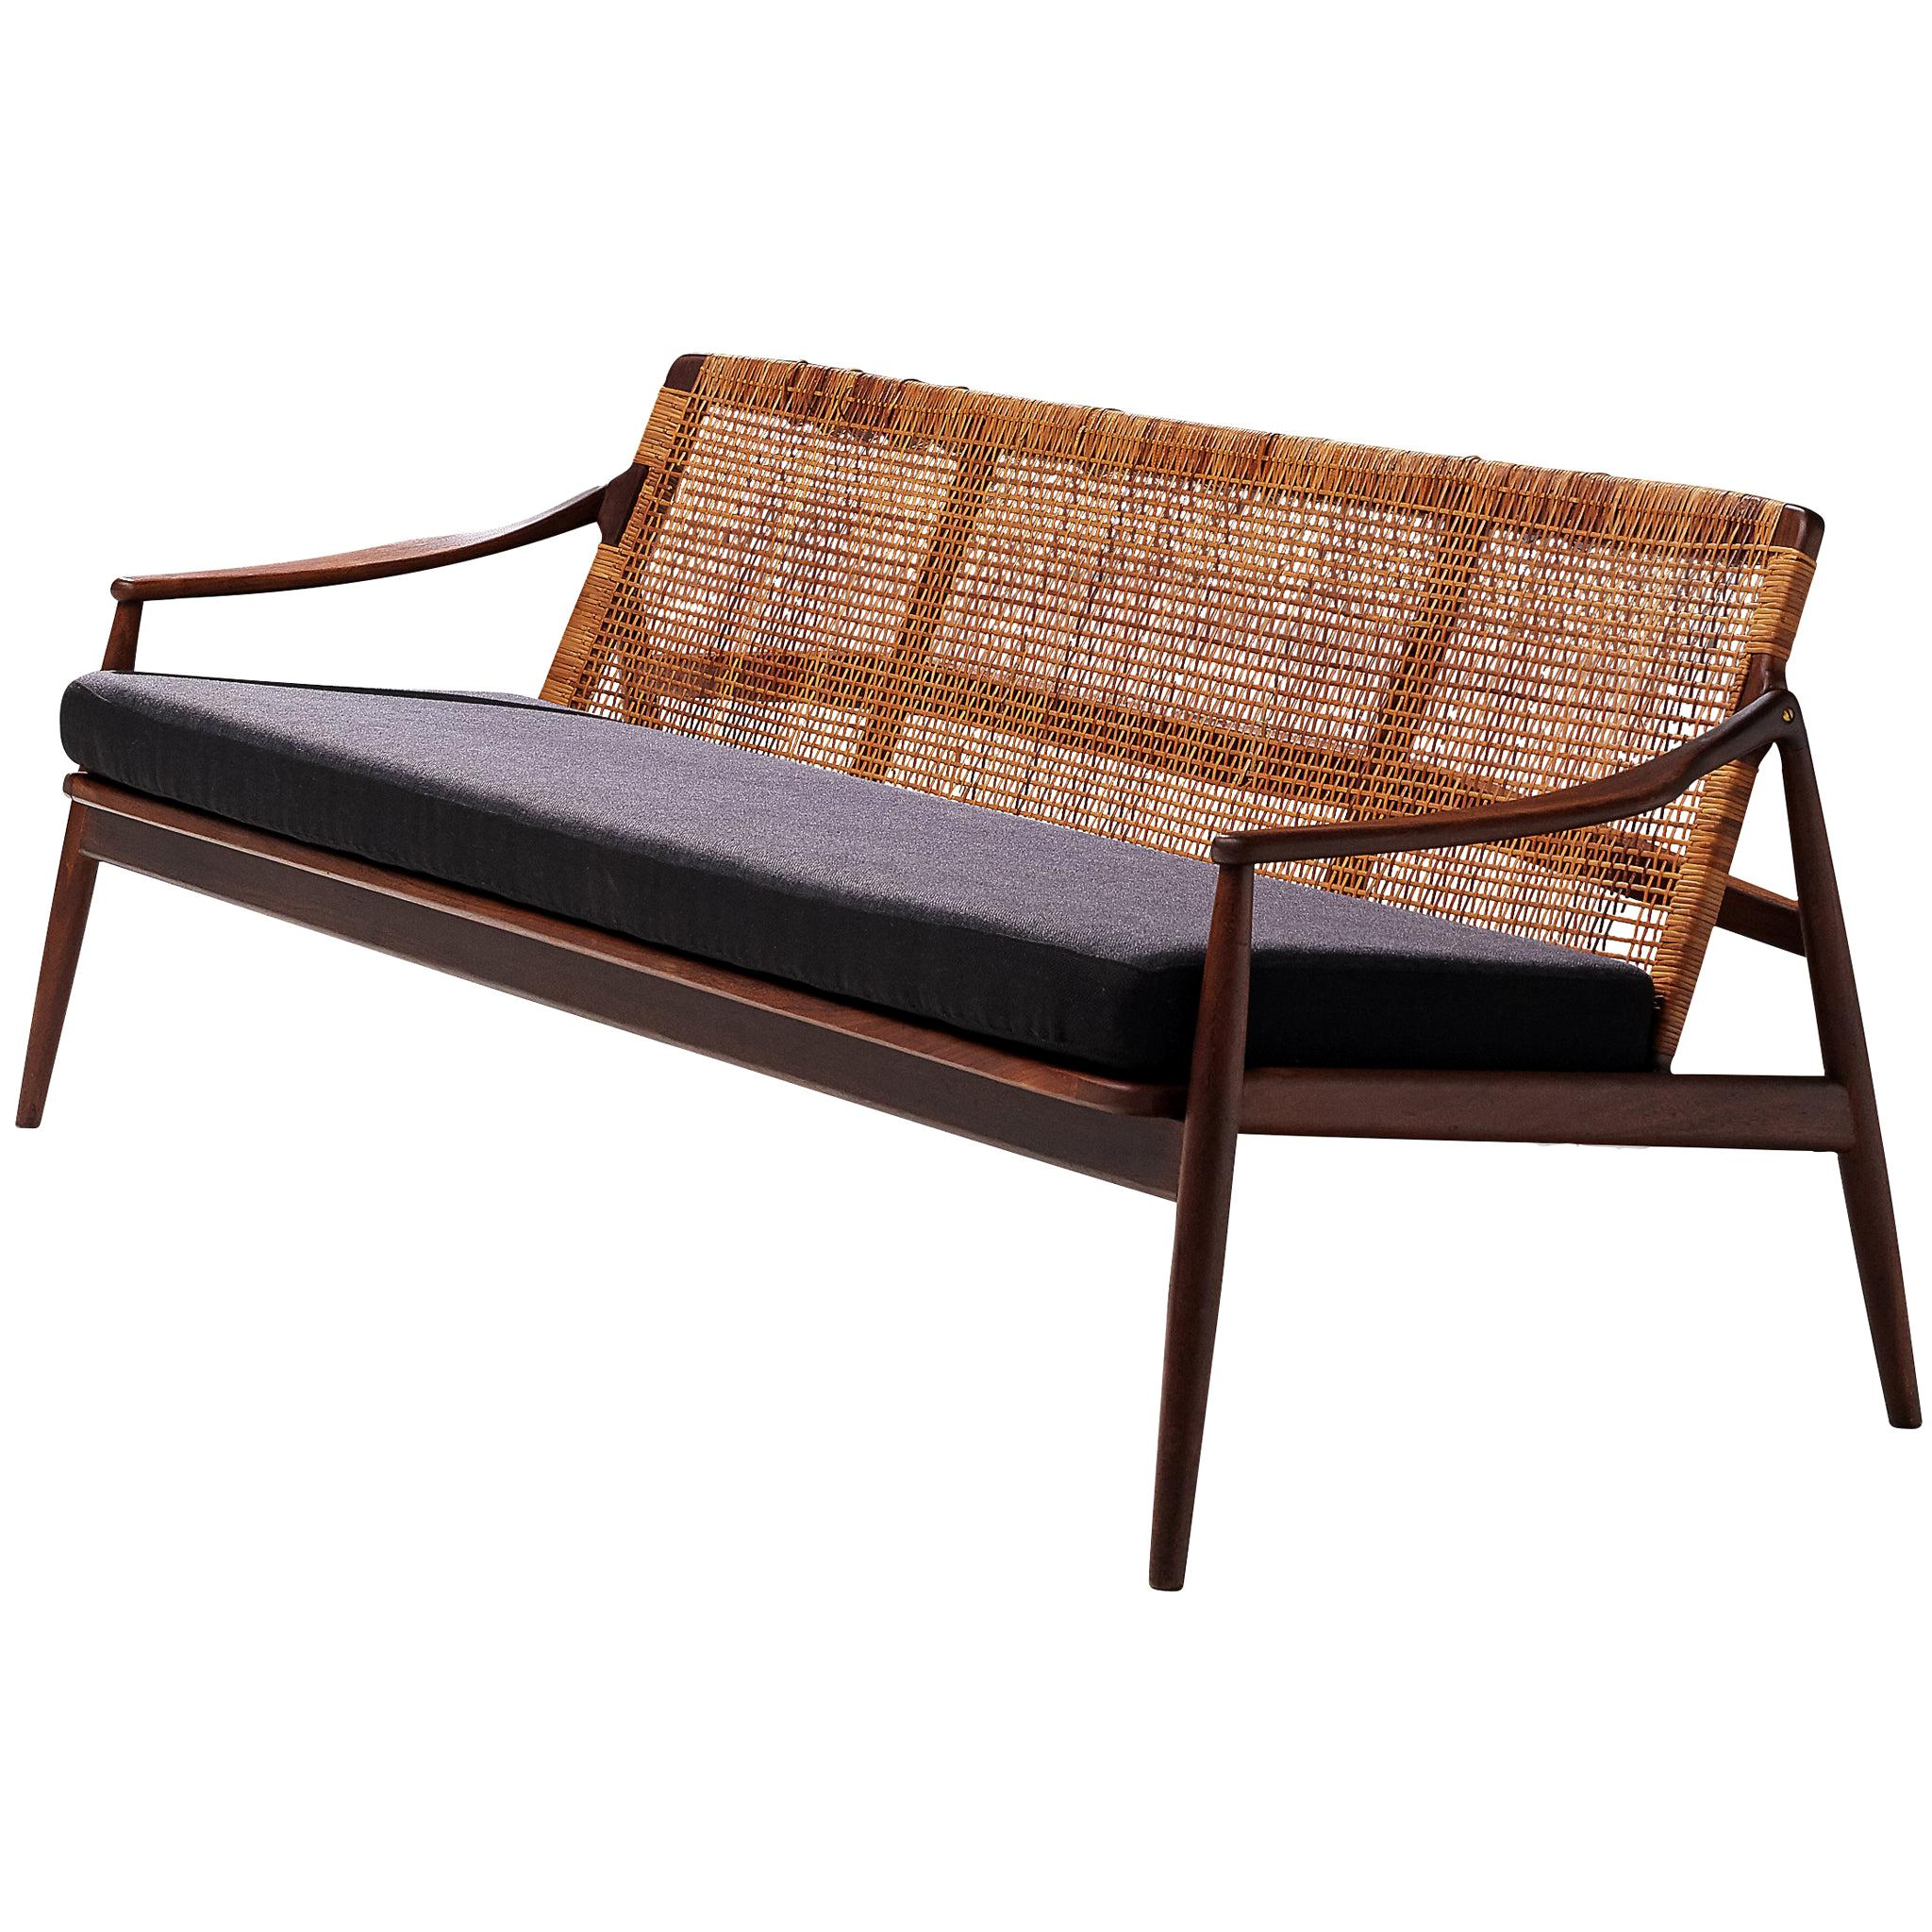 Hartmut Lohmeyer Three-Seat Sofa in Teak and Rattan